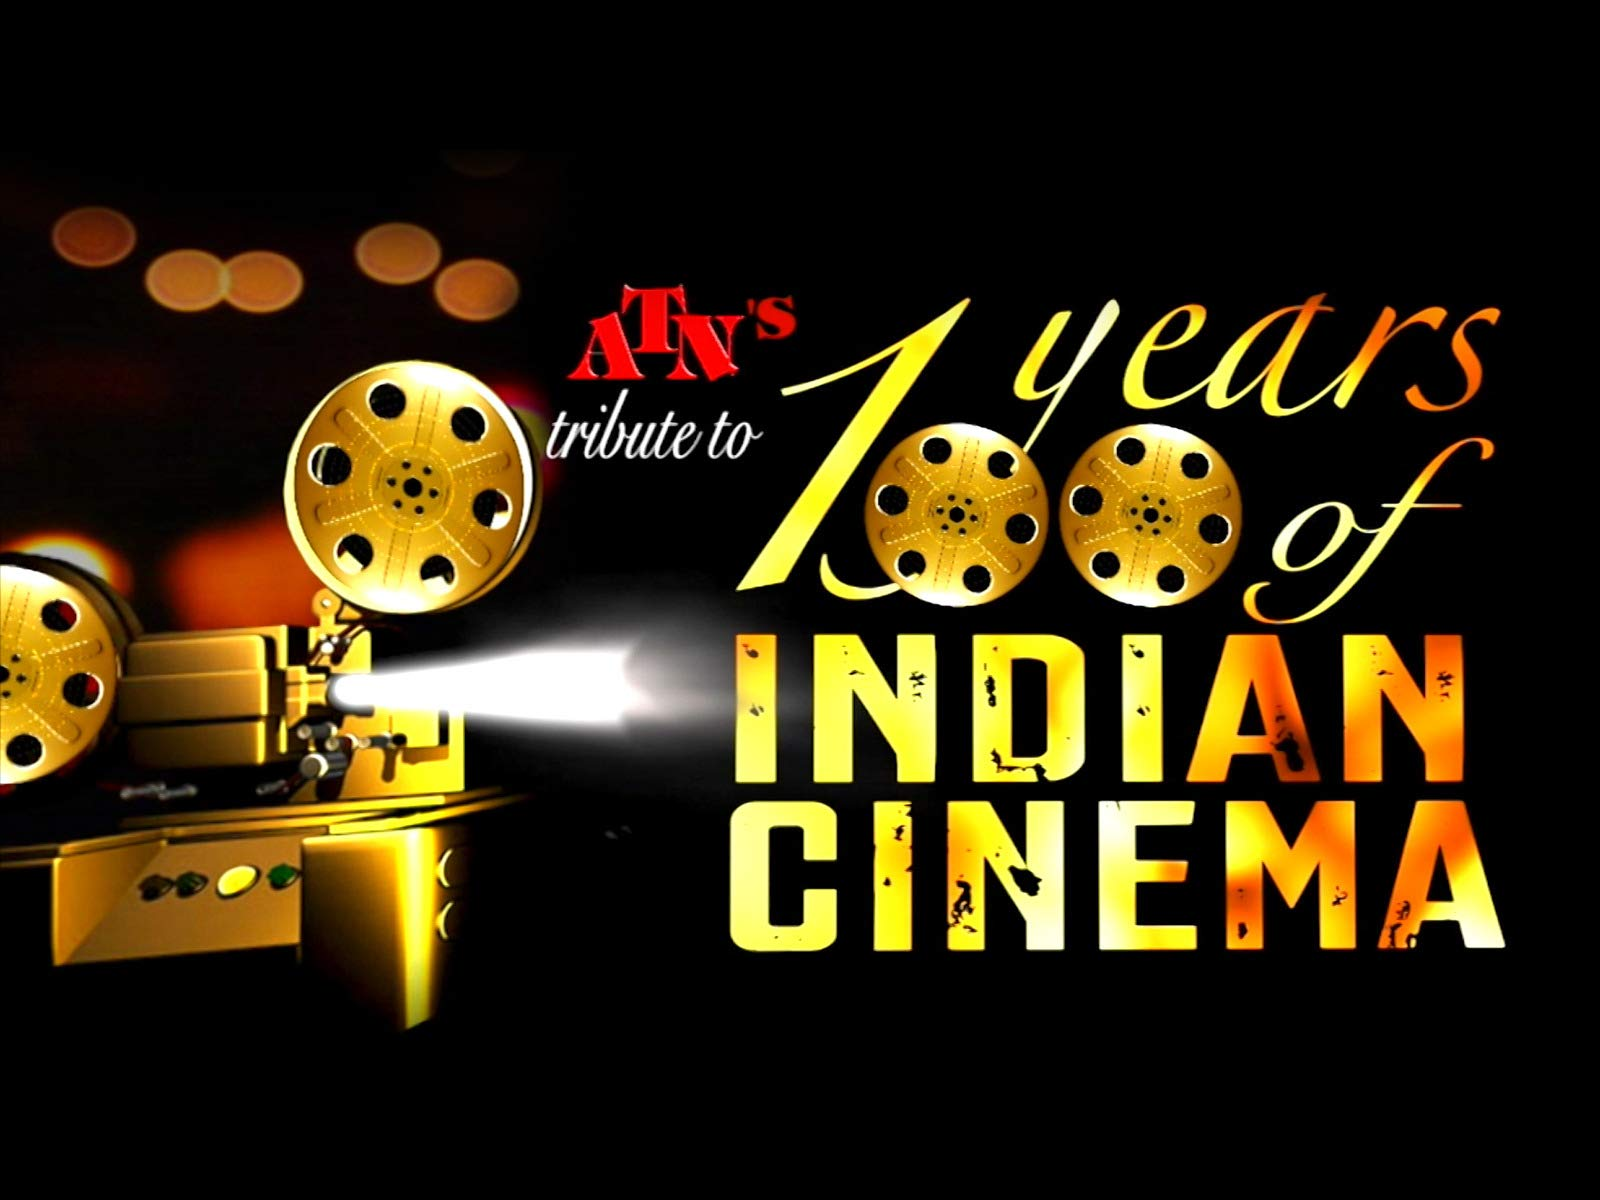 ATN's Tribute to 100 Years of Indian Cinema - Season 24